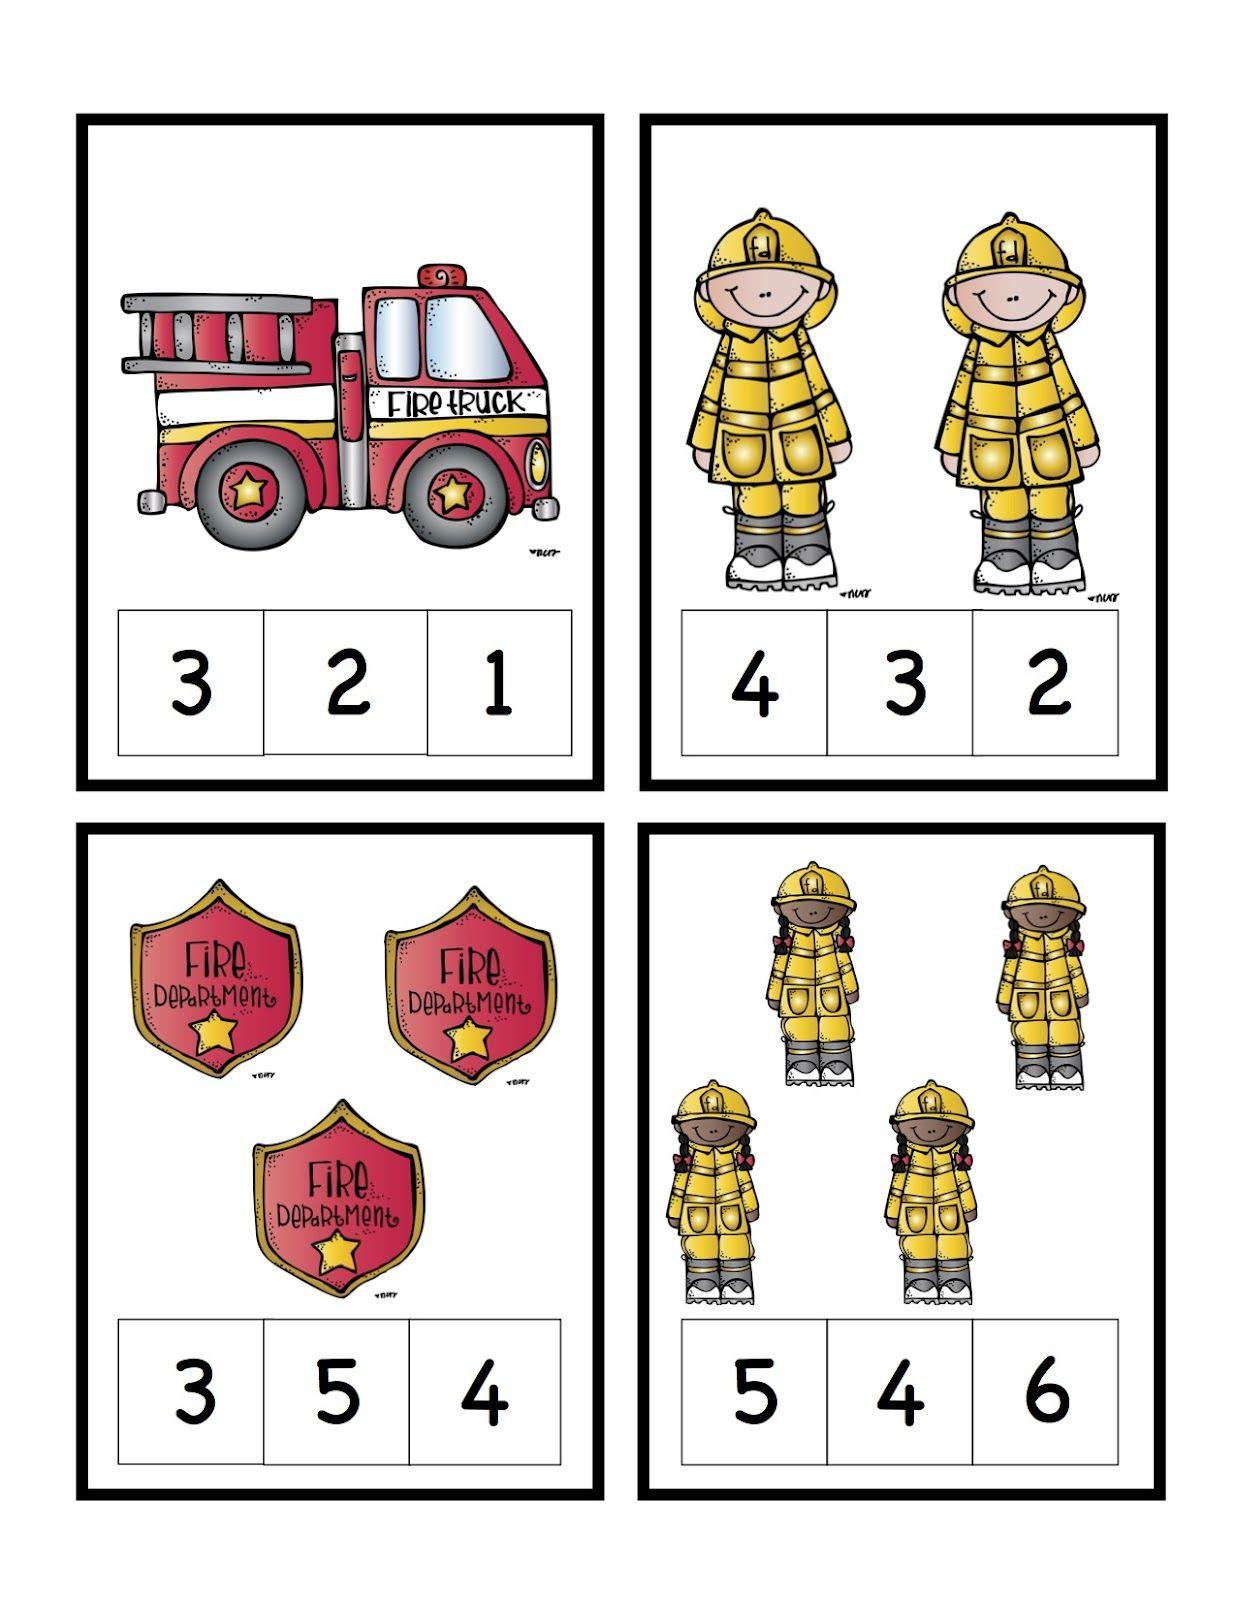 Preschool Printables Fire Safety Preschool Fire Safety Fire Safety Activities [ 1600 x 1236 Pixel ]